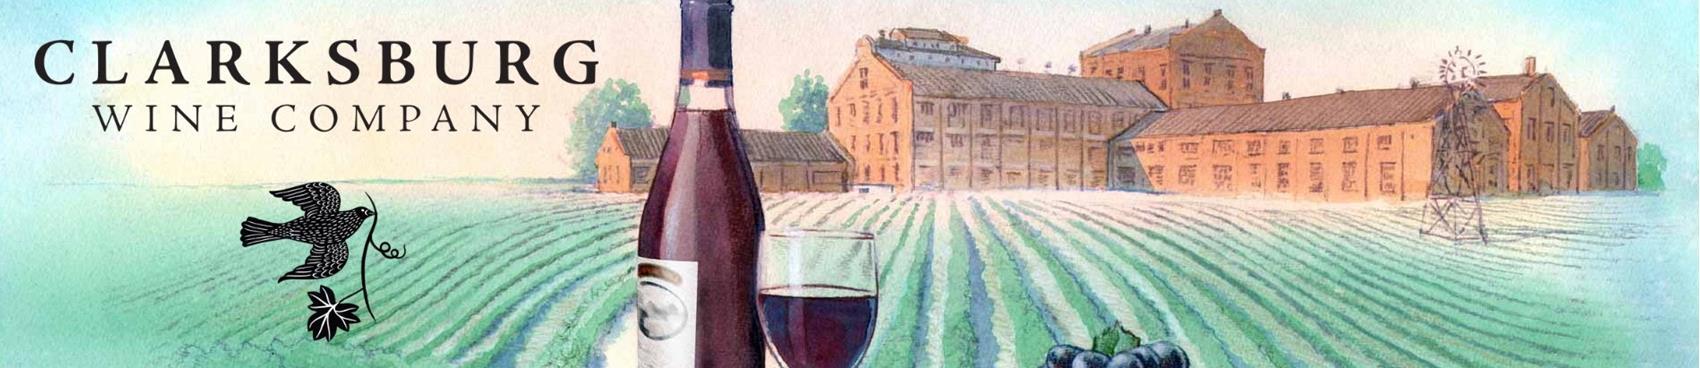 Clarksburg Wine Company